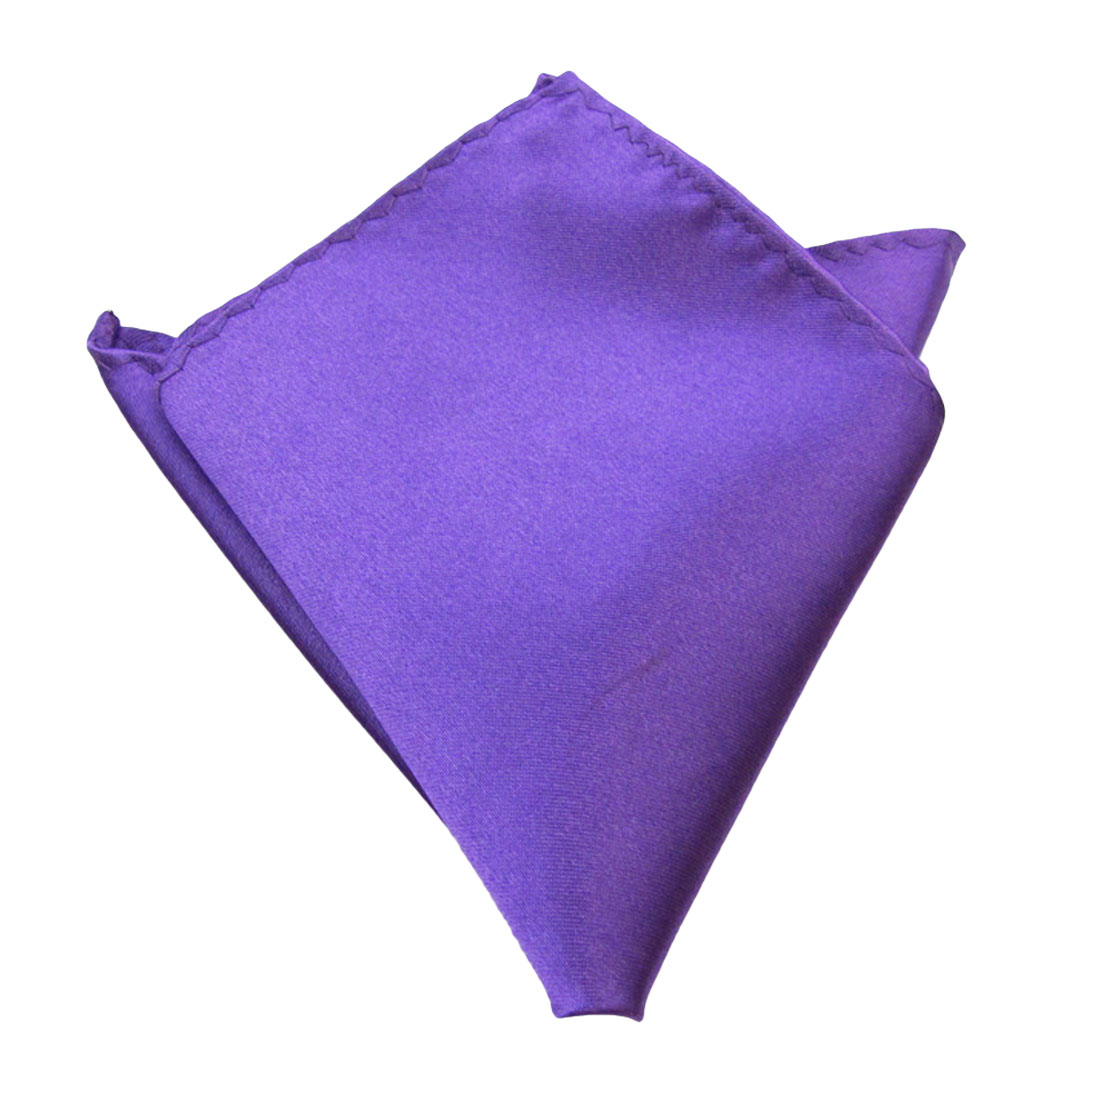 Top Sell Men's Retro Style Pocket Square Wedding Men's Handkerchief Hanky Wedding Party